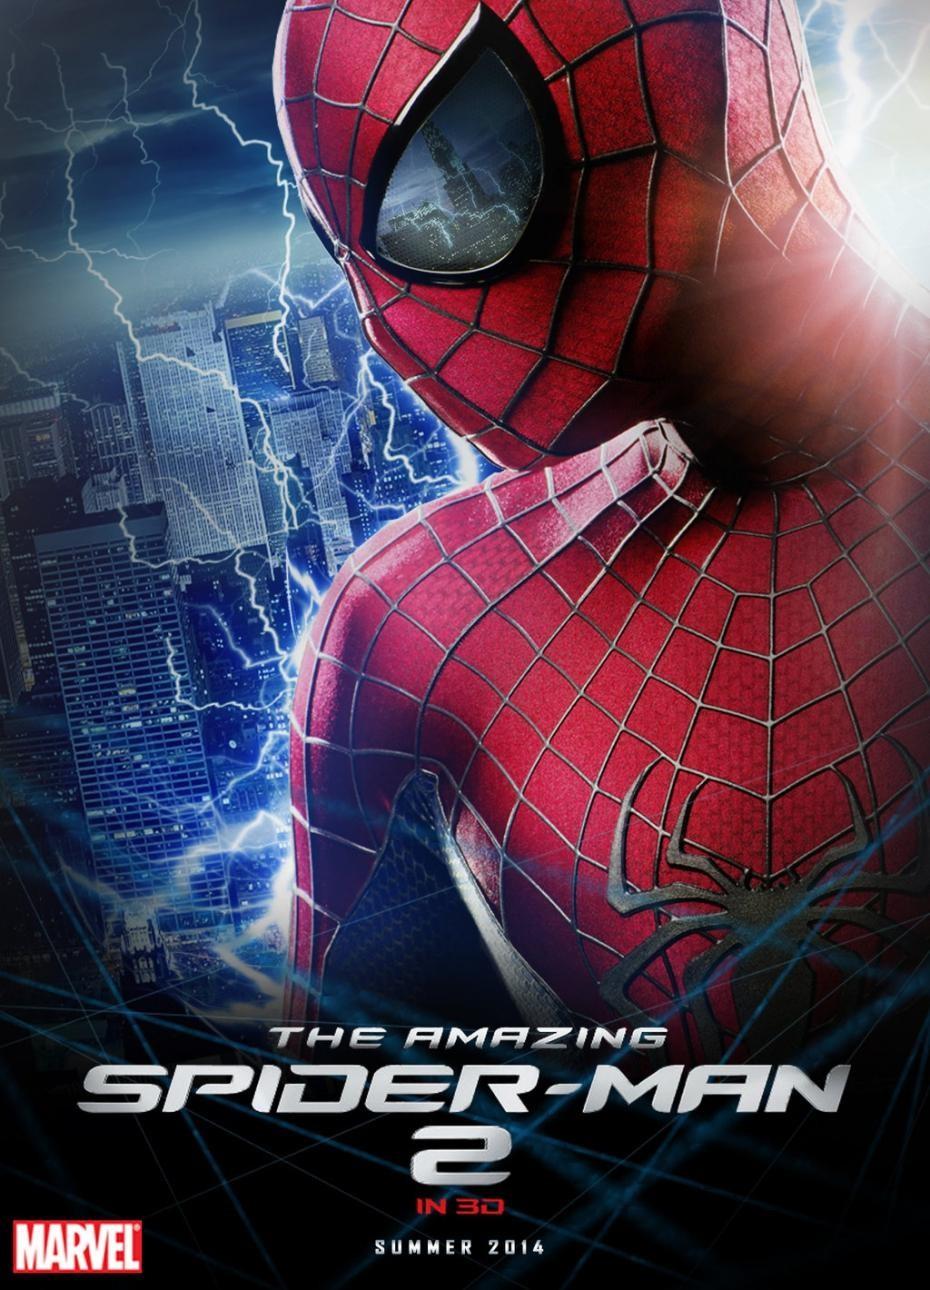 affiche et photos the amazing spider man 2 2014. Black Bedroom Furniture Sets. Home Design Ideas